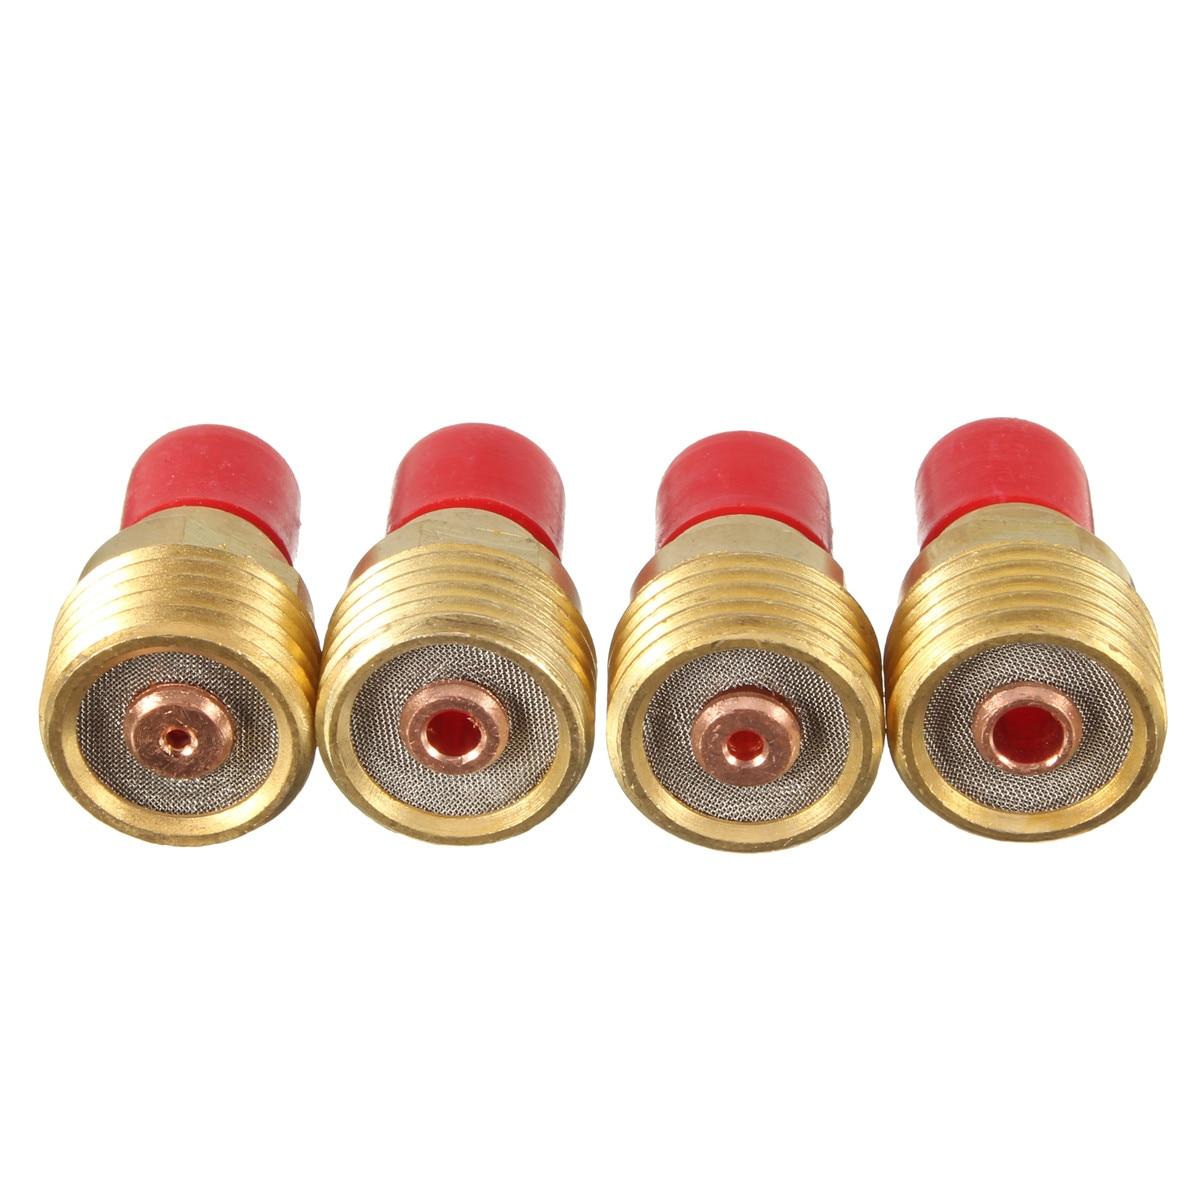 46Pcs TIG Gas Lens Collet Body KIT Back Cap For TIG Welding Torch SR WP9 20